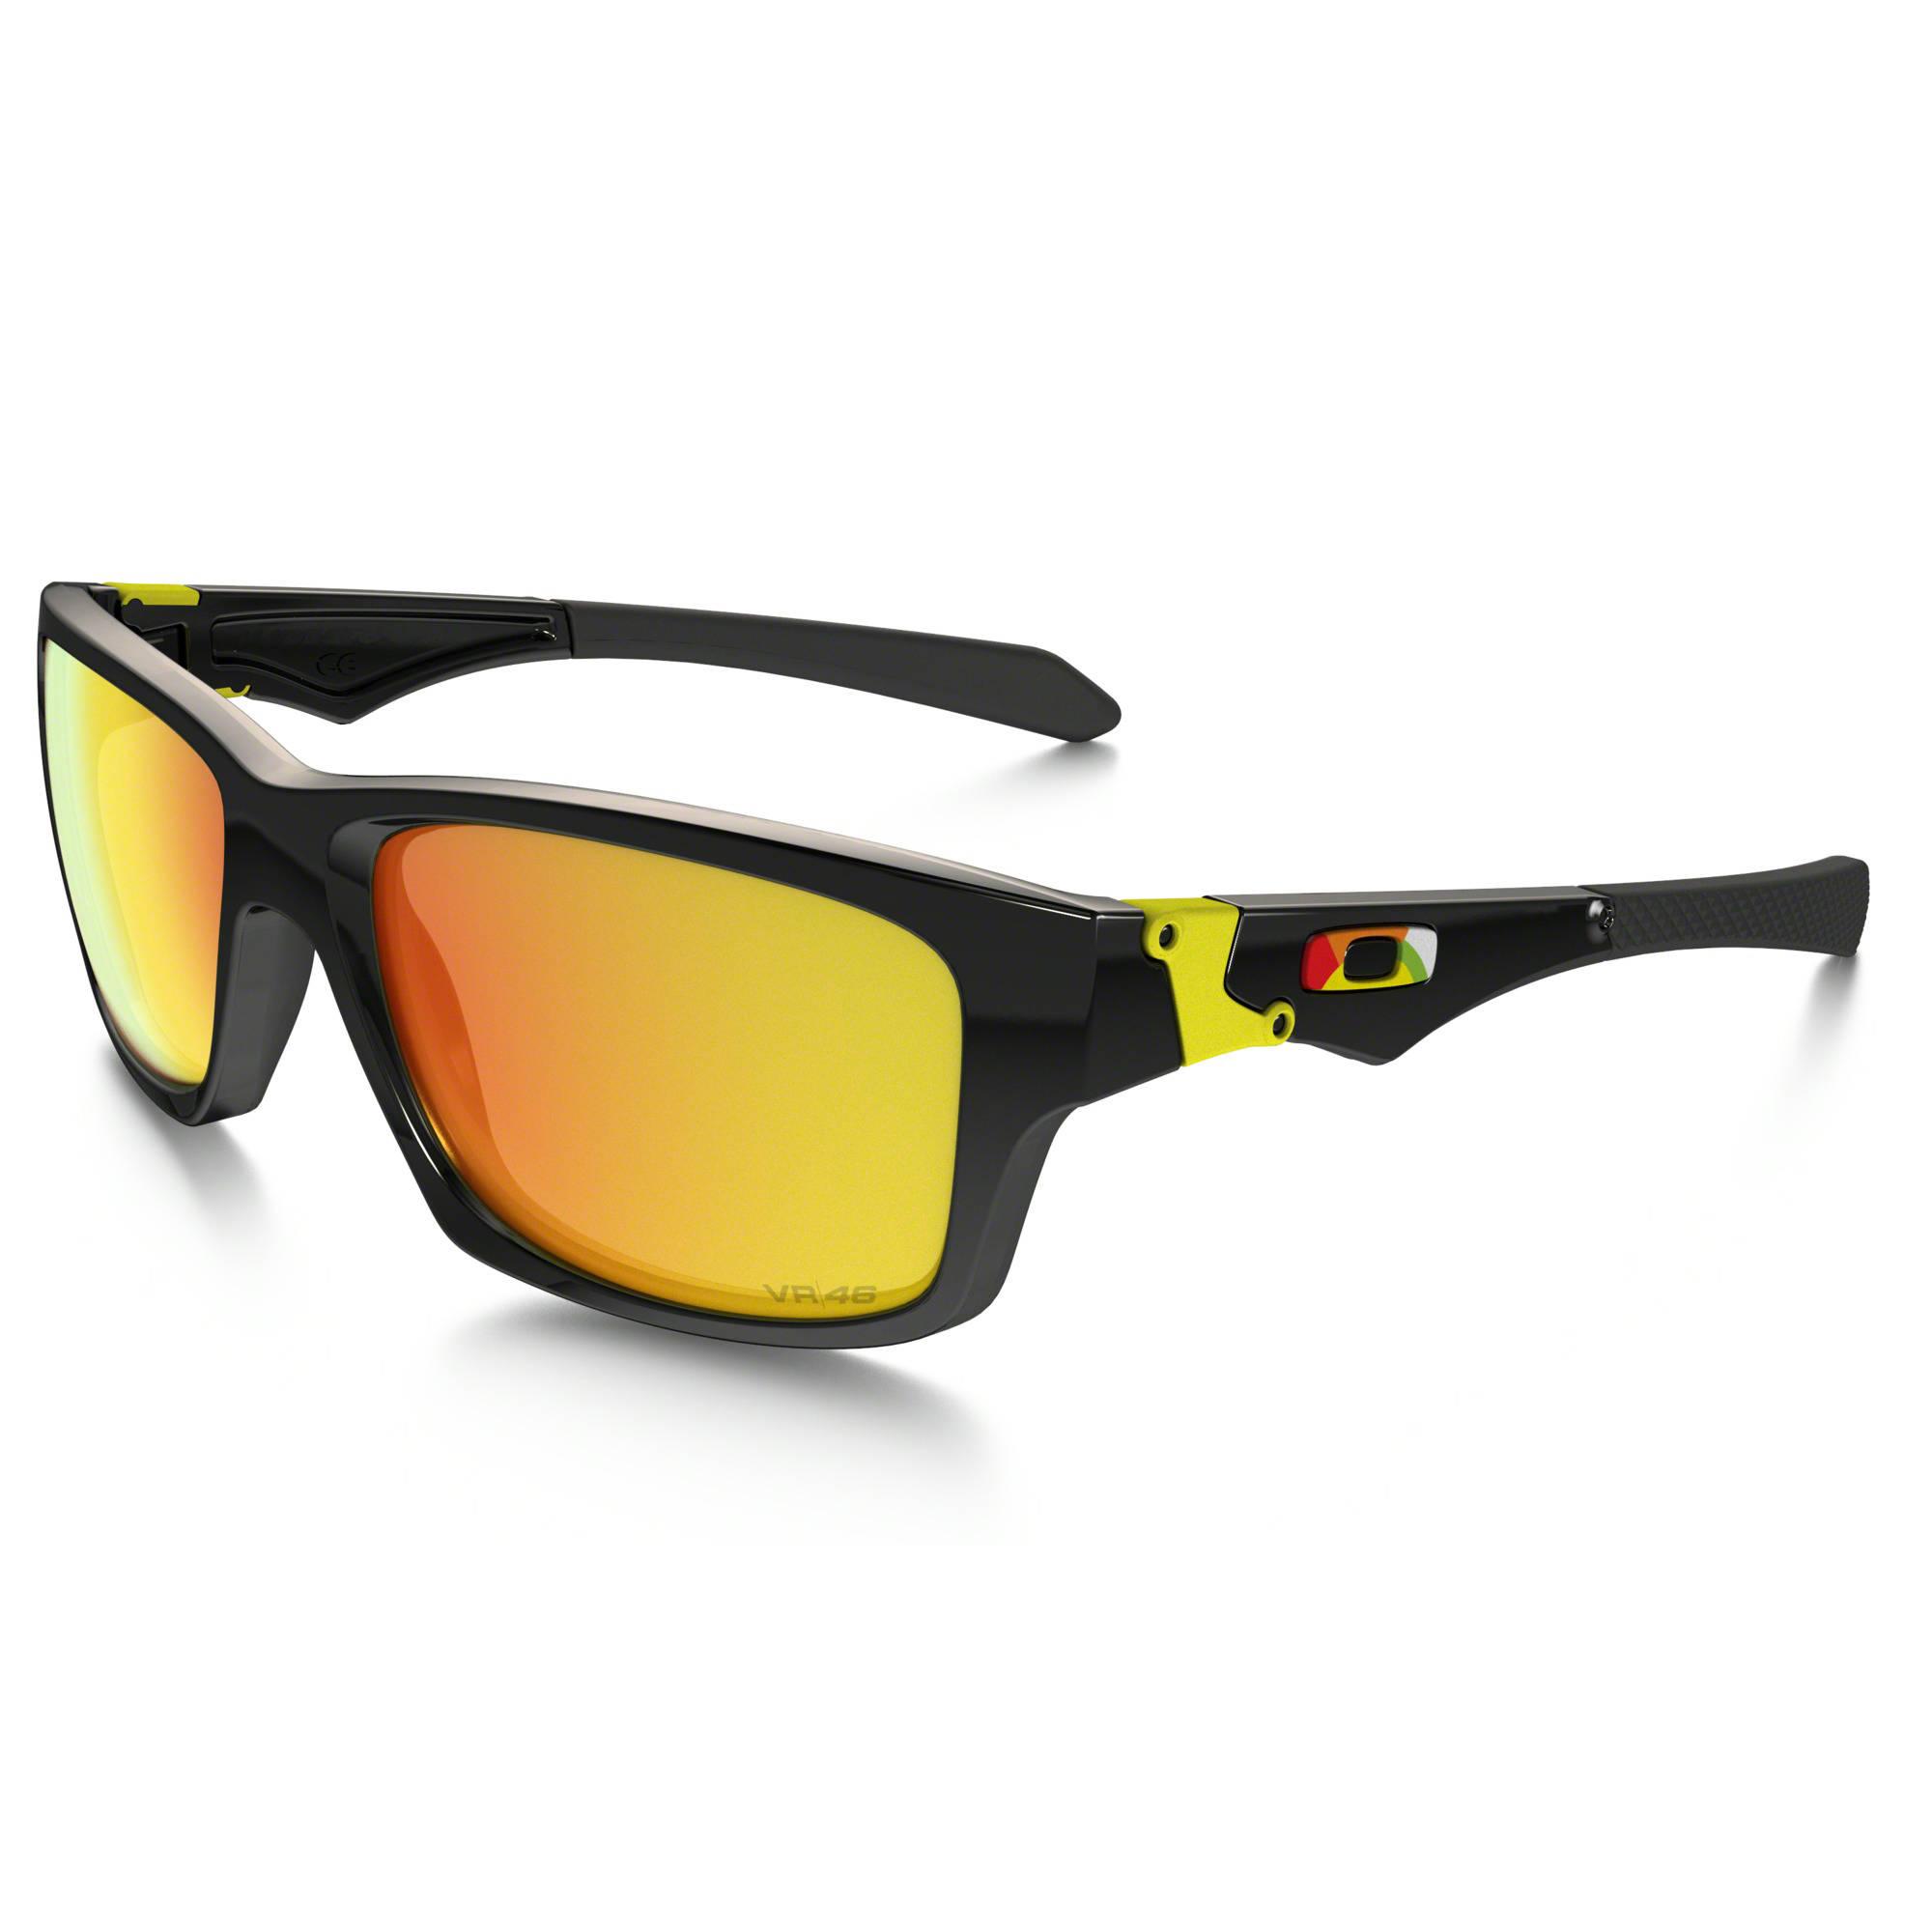 black and yellow oakley sunglasses r7ig  Oakley Valentino Rossi Sunglasses Polished Black Frames, Fire Iridium  Lenses